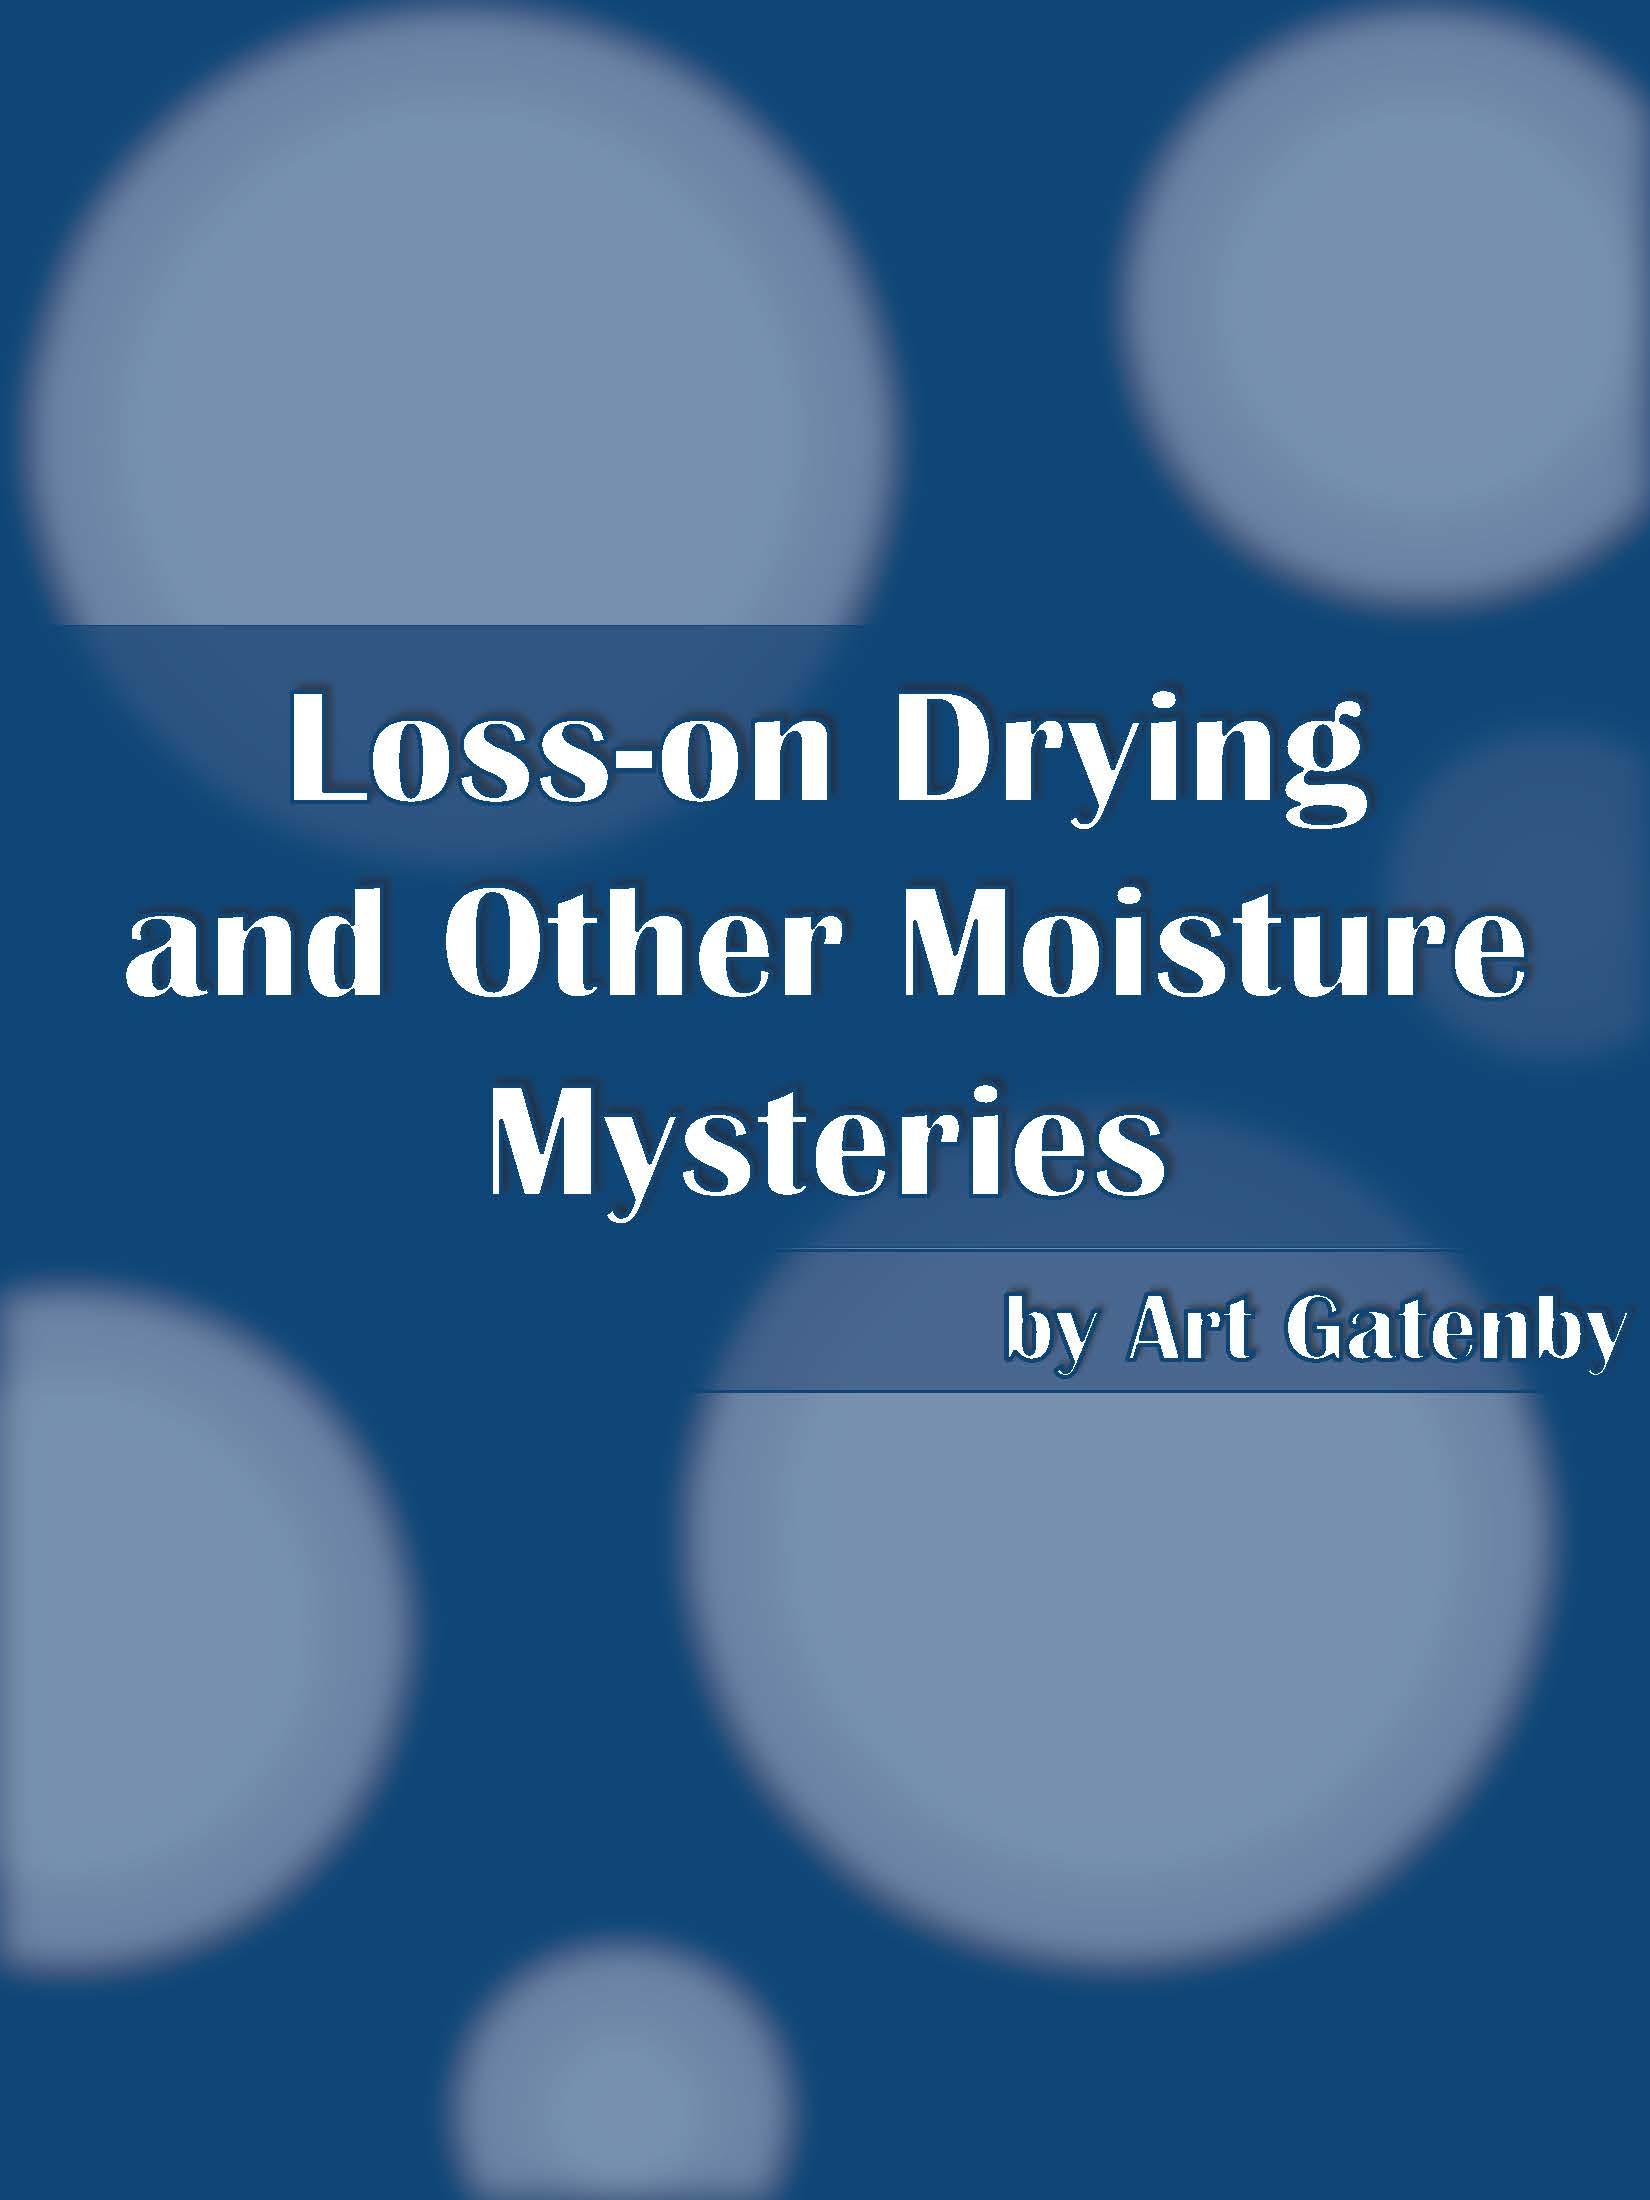 Moisture Mysteries ebook